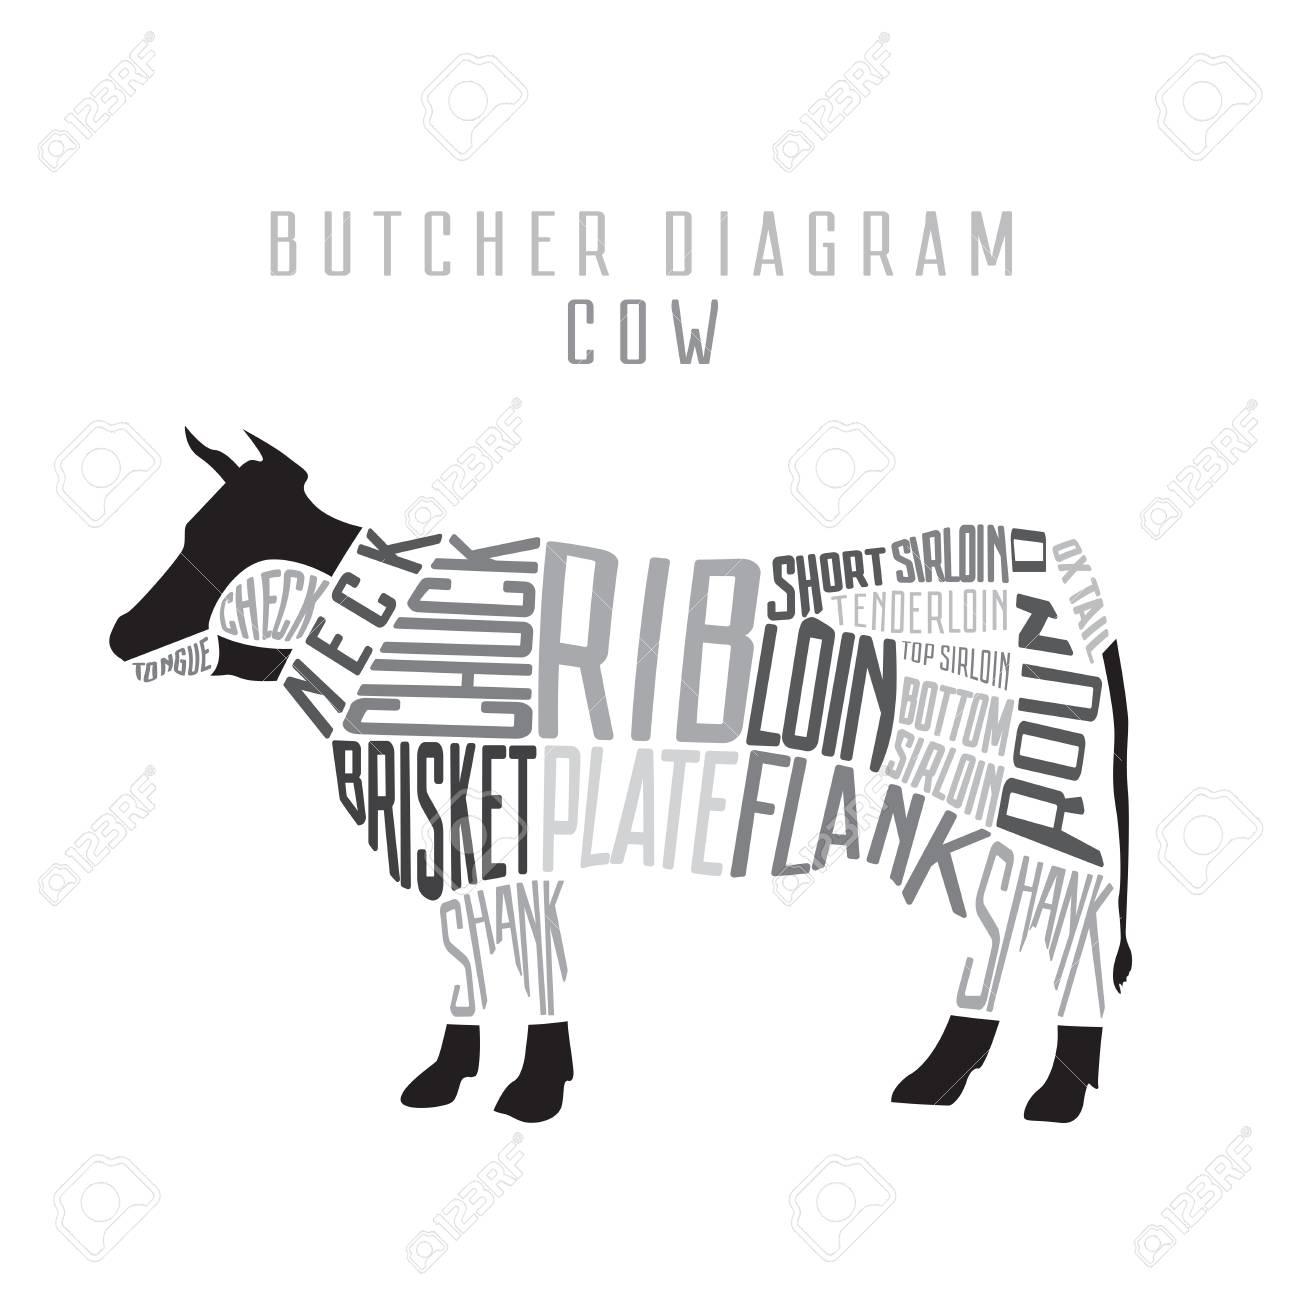 Cow butcher diagram cut of beef set typographic vintage vector cow butcher diagram cut of beef set typographic vintage vector illustration stock vector ccuart Gallery